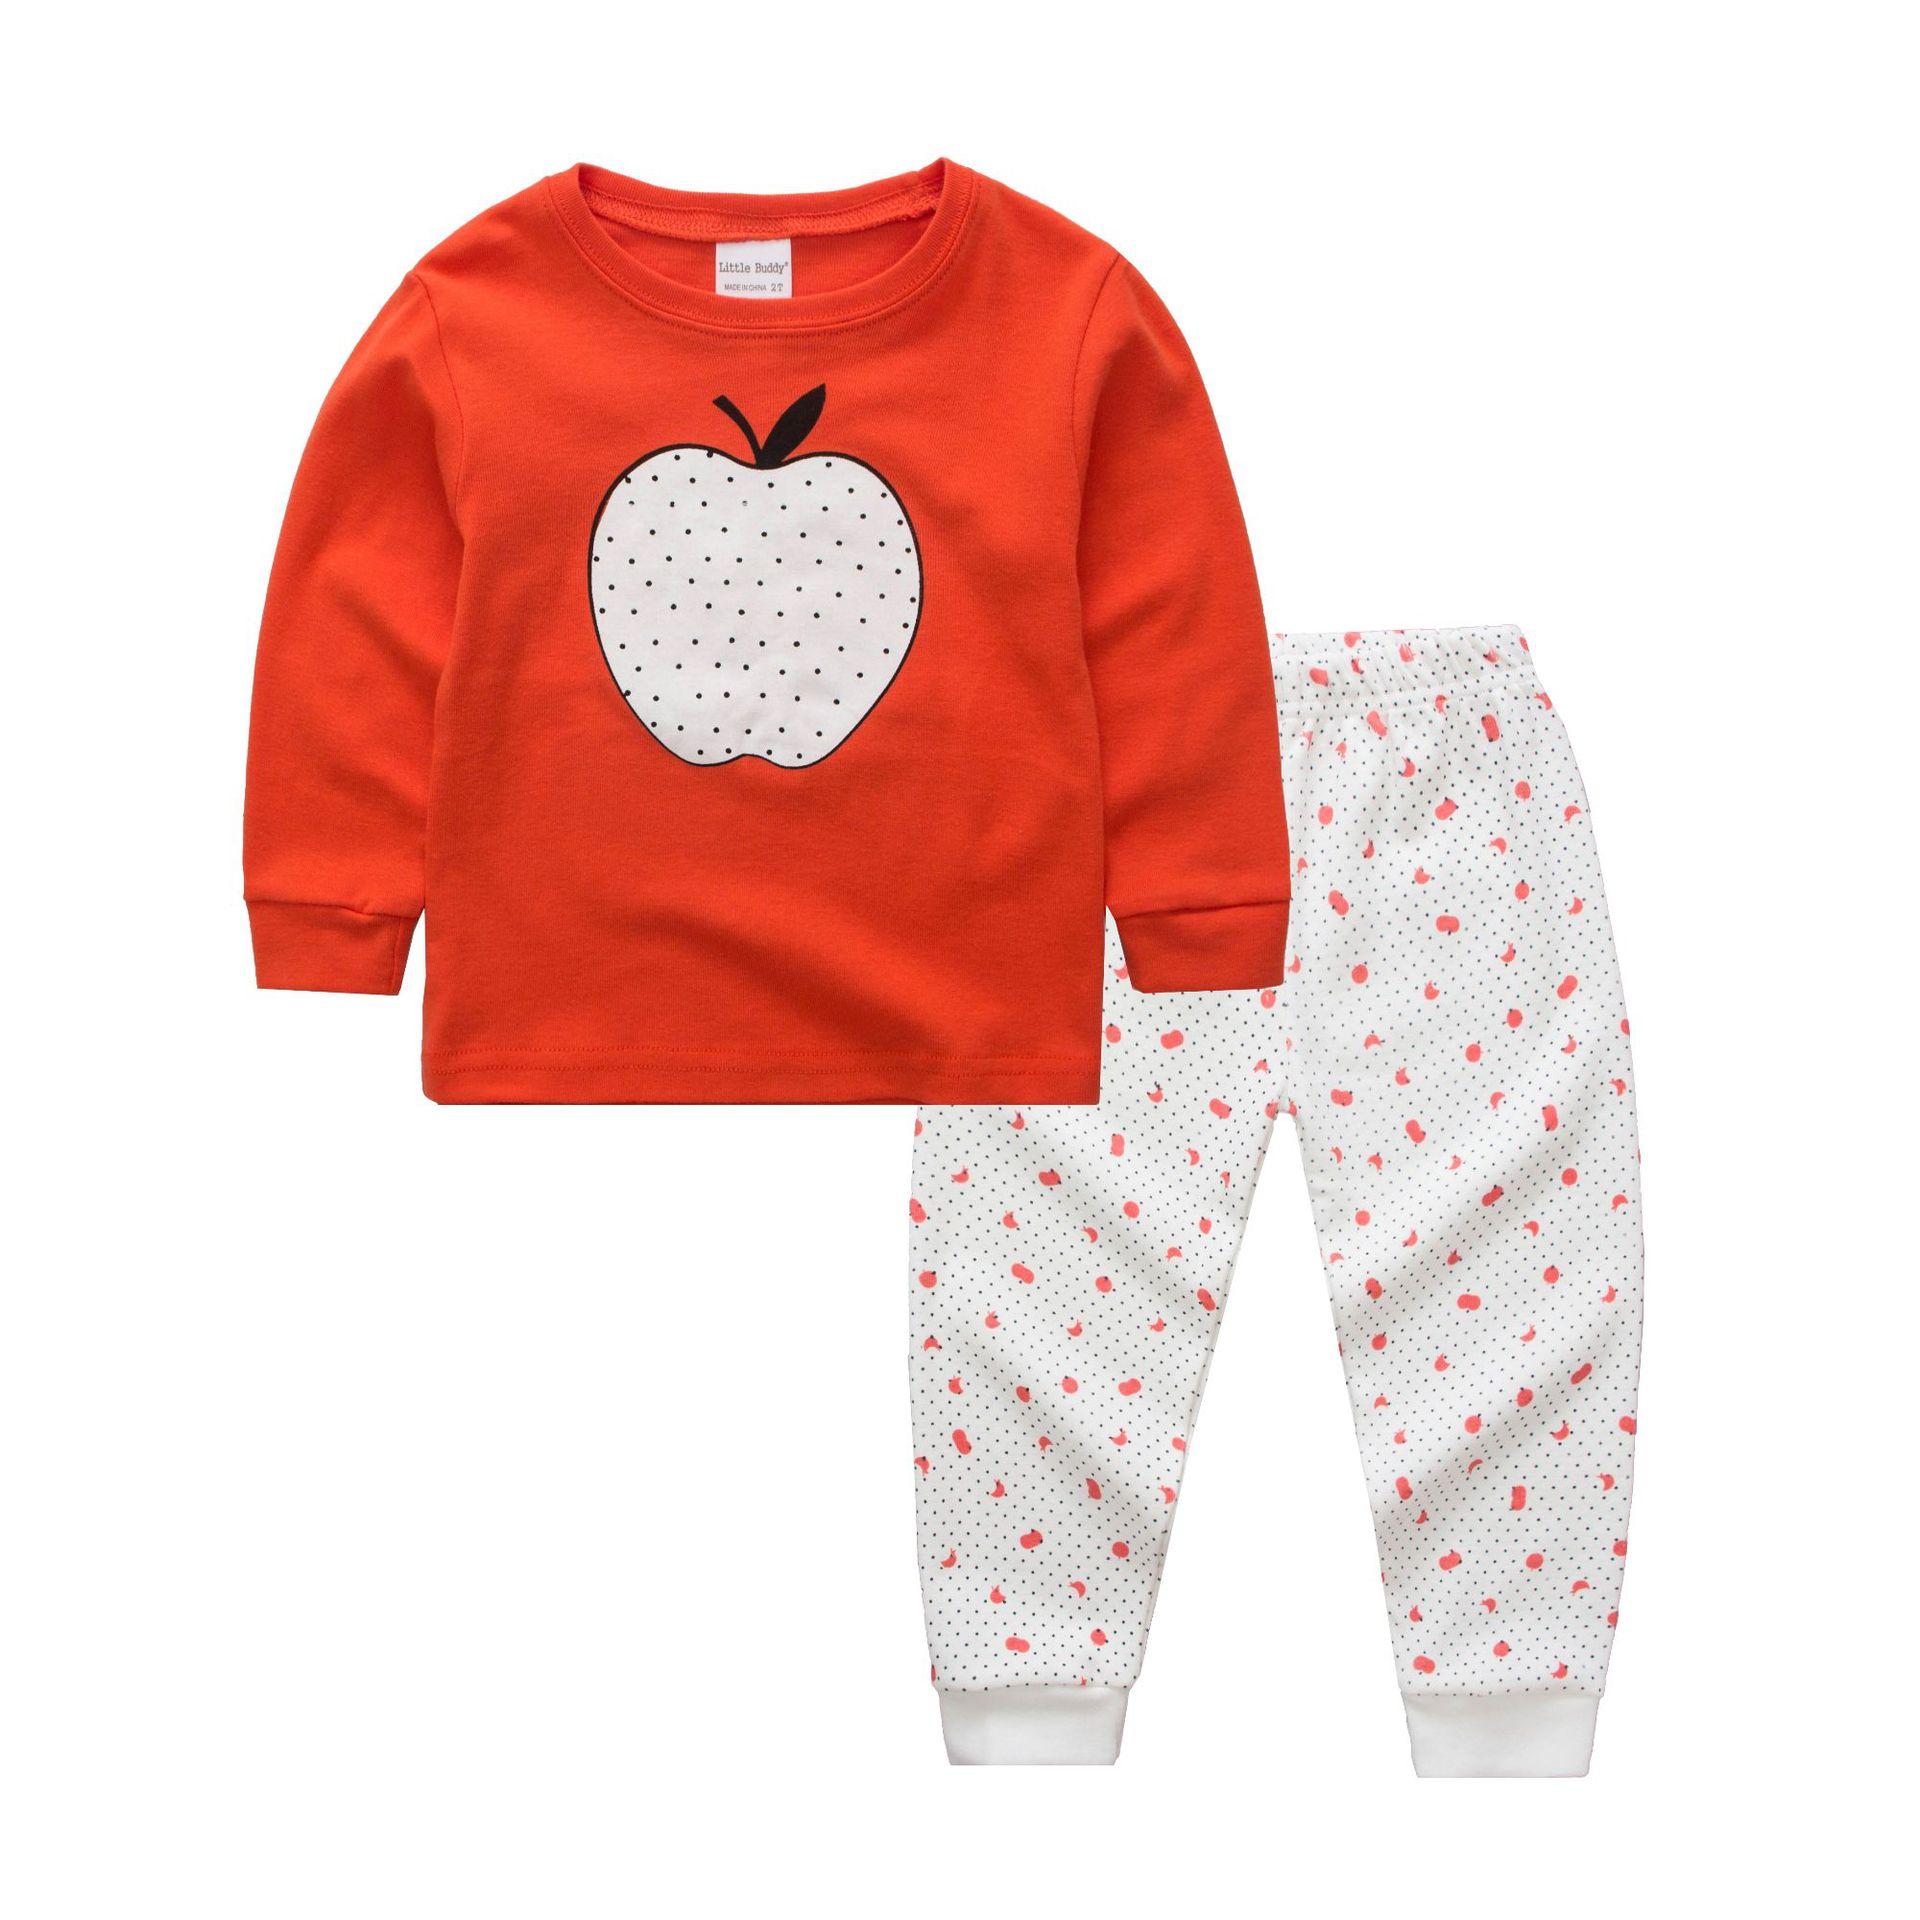 Niños Pijamas Pijama de algodón para niños niña ropa de dormir primavera otoño ropa de manga larga Apple patrón 2-7y